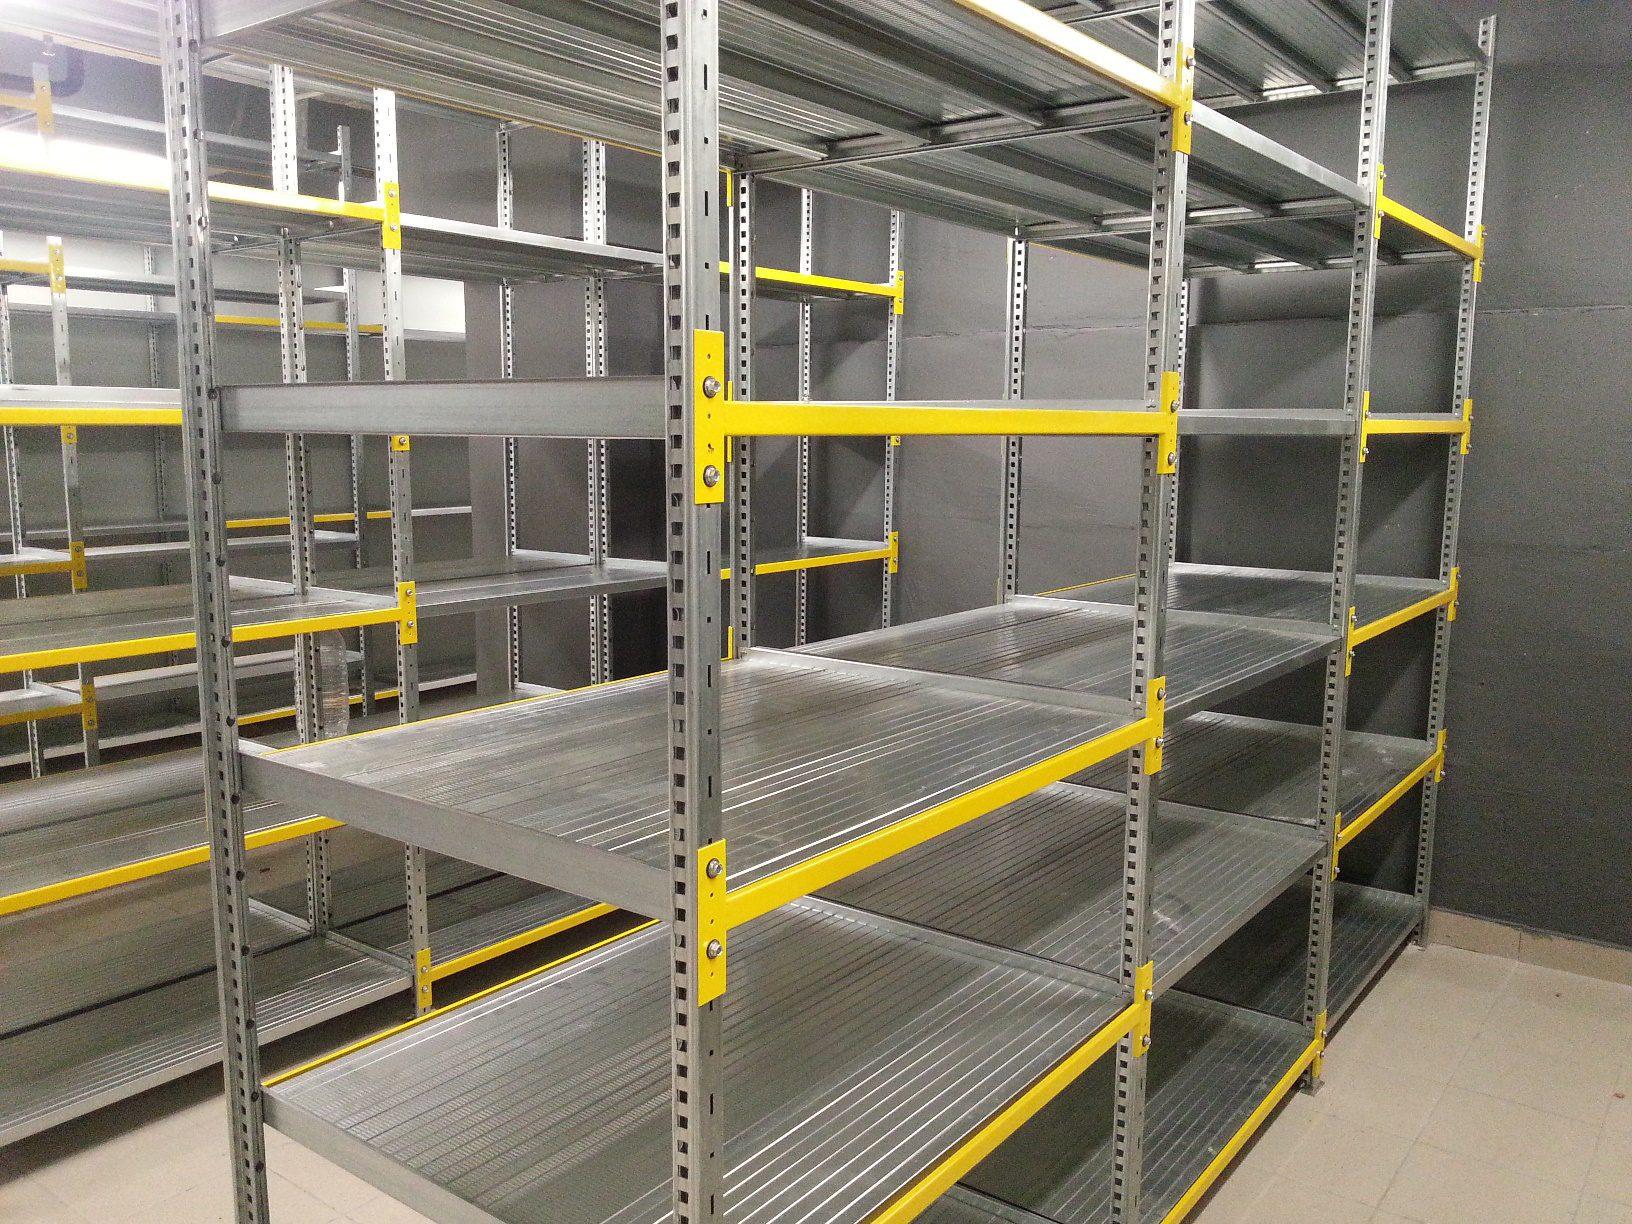 Параметры металлических стеллажей для склада